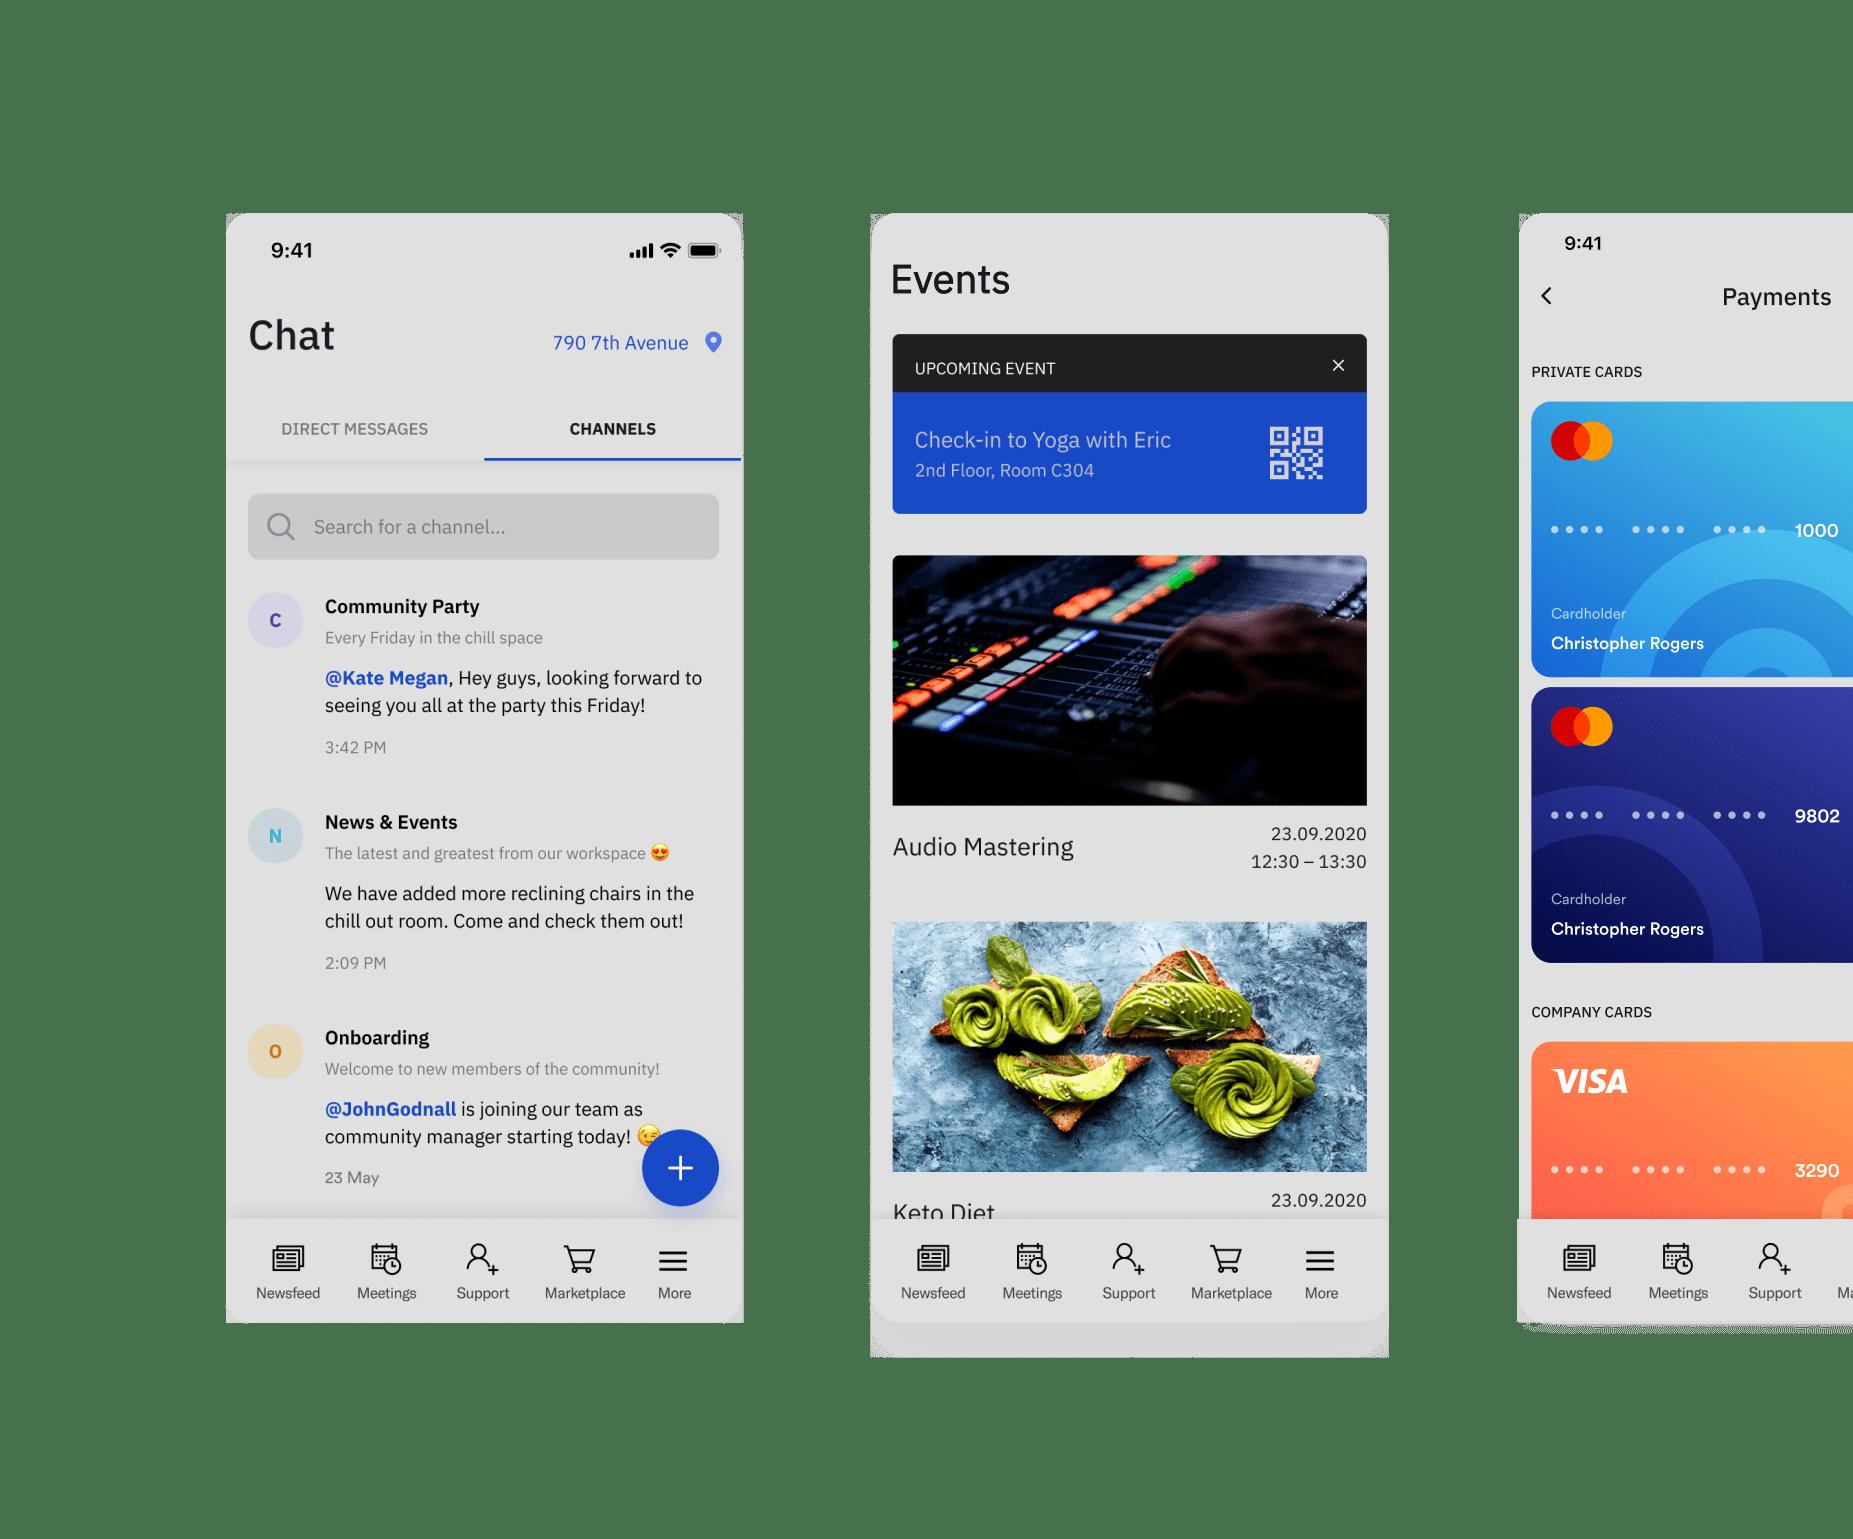 The Super-App